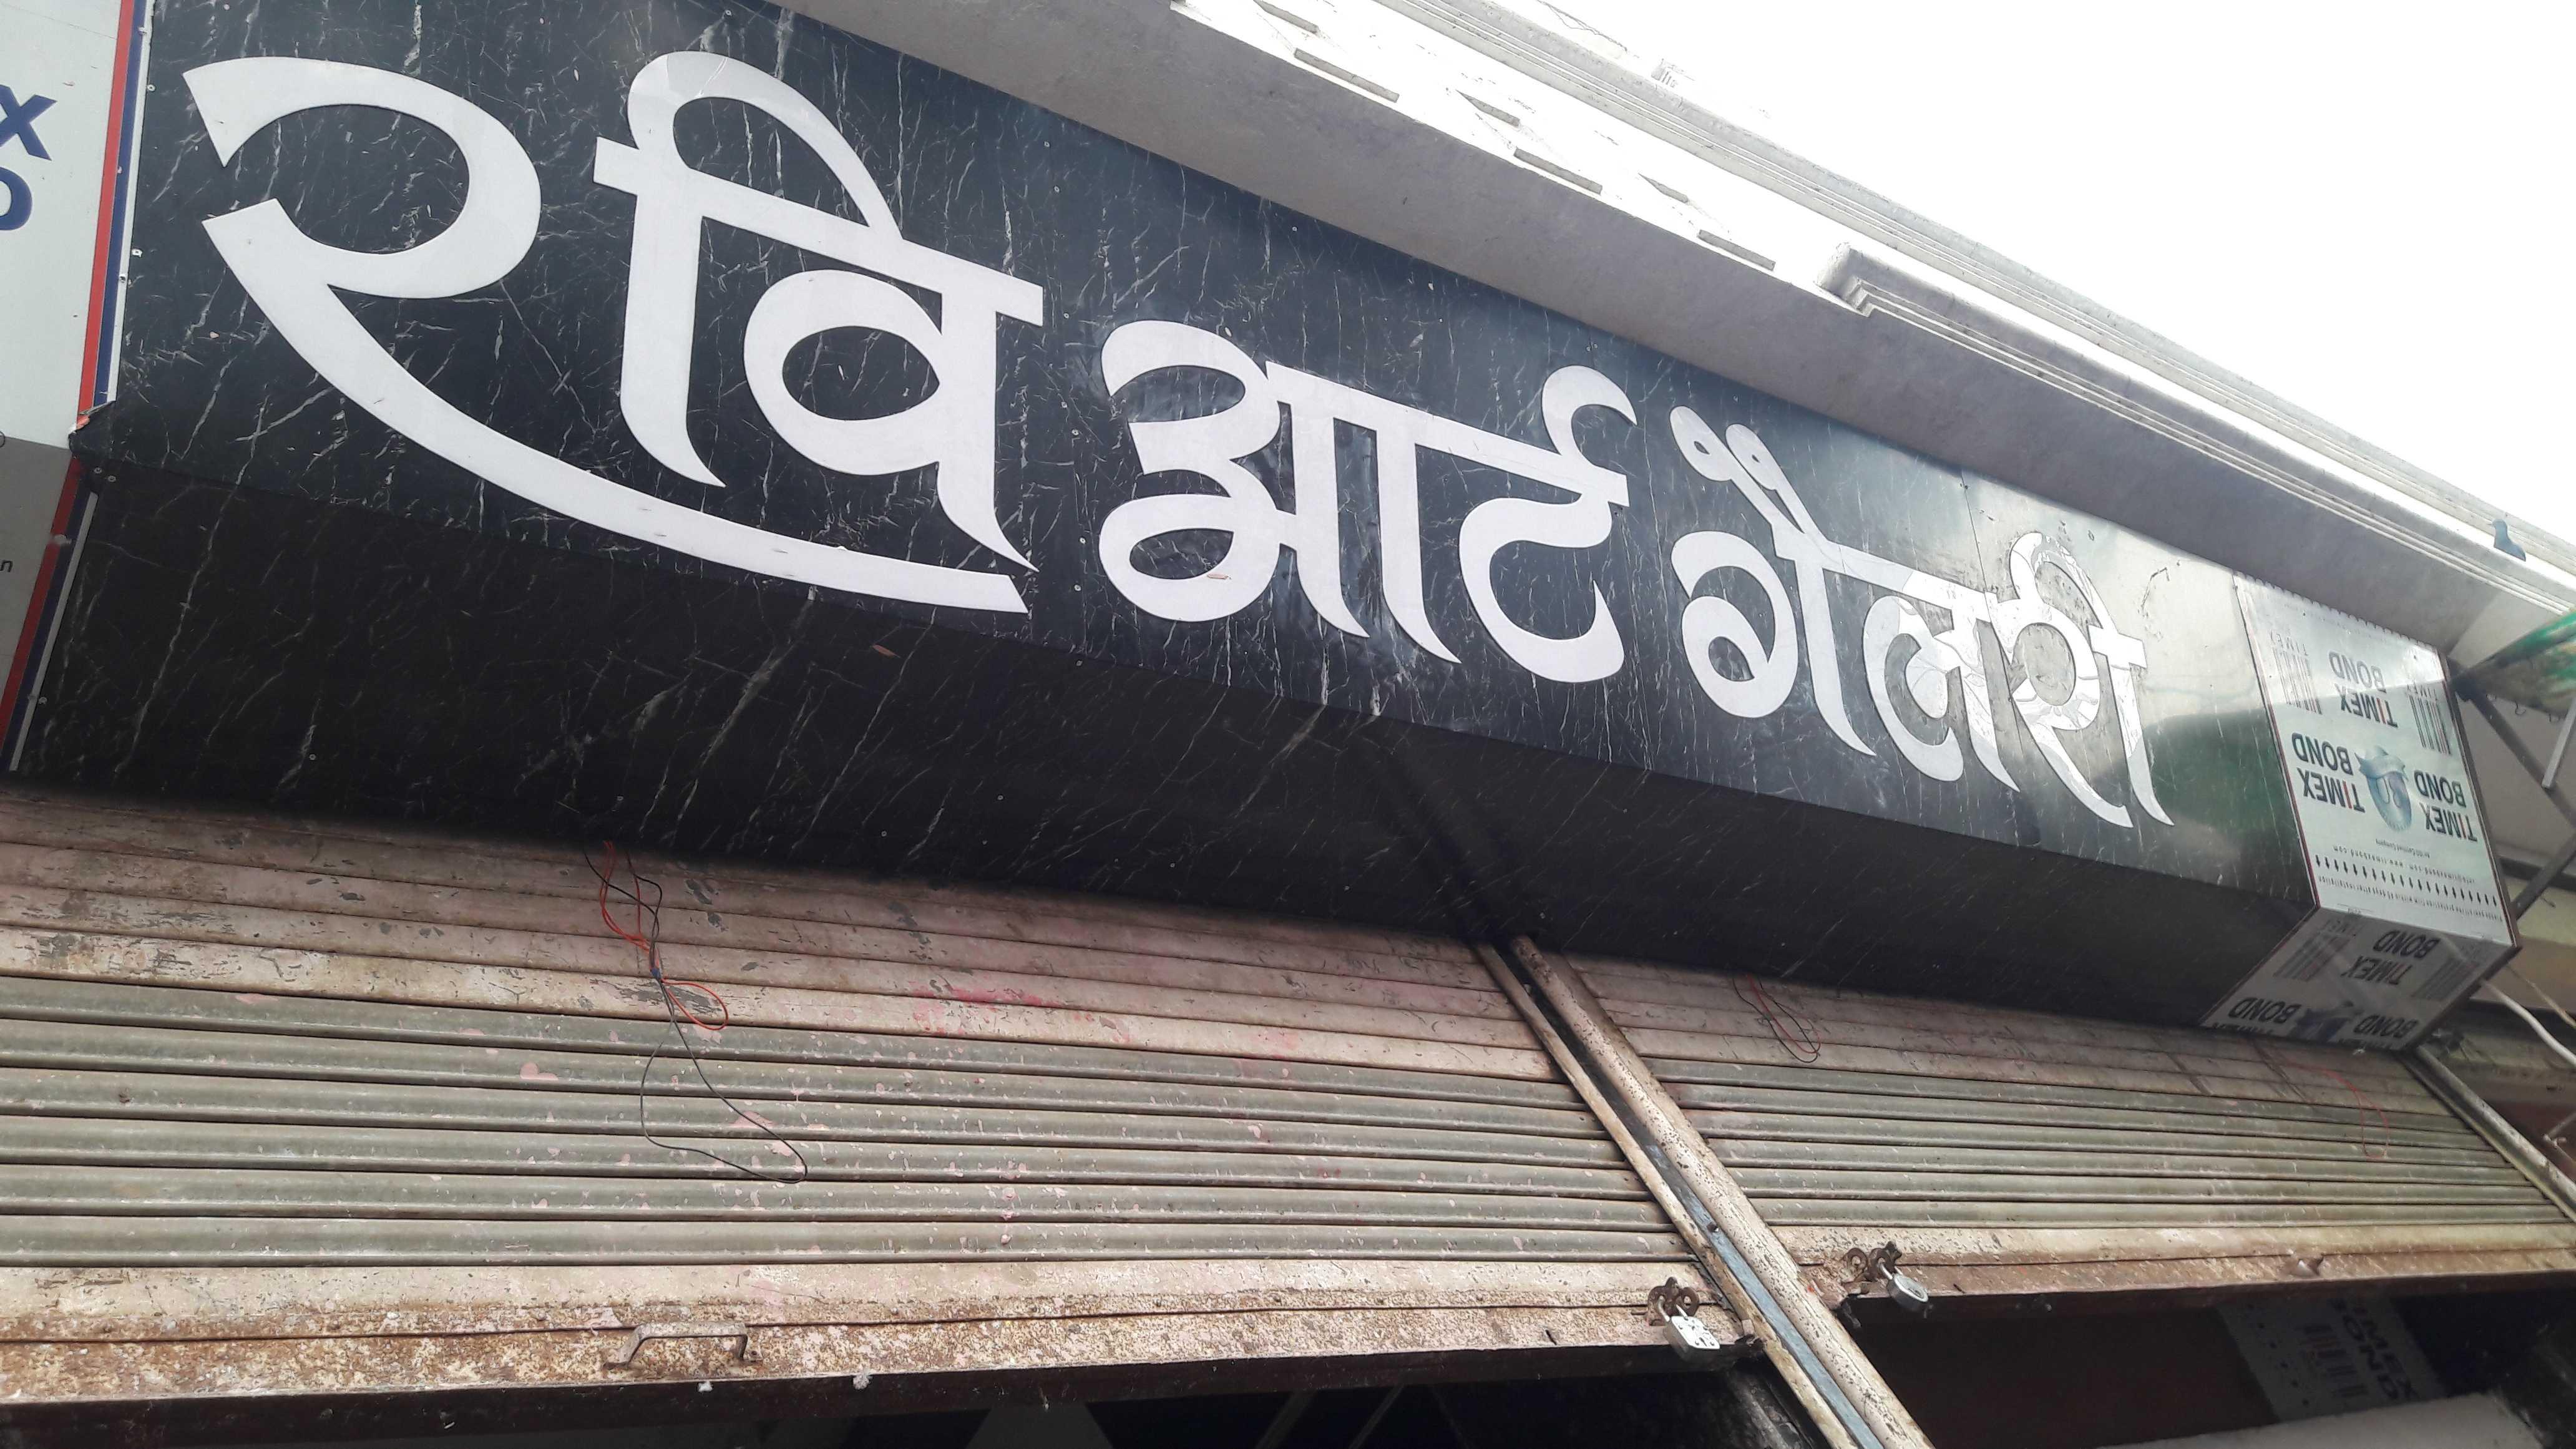 Ravi Art Gallery in vrindavan bazaar-fnbworld